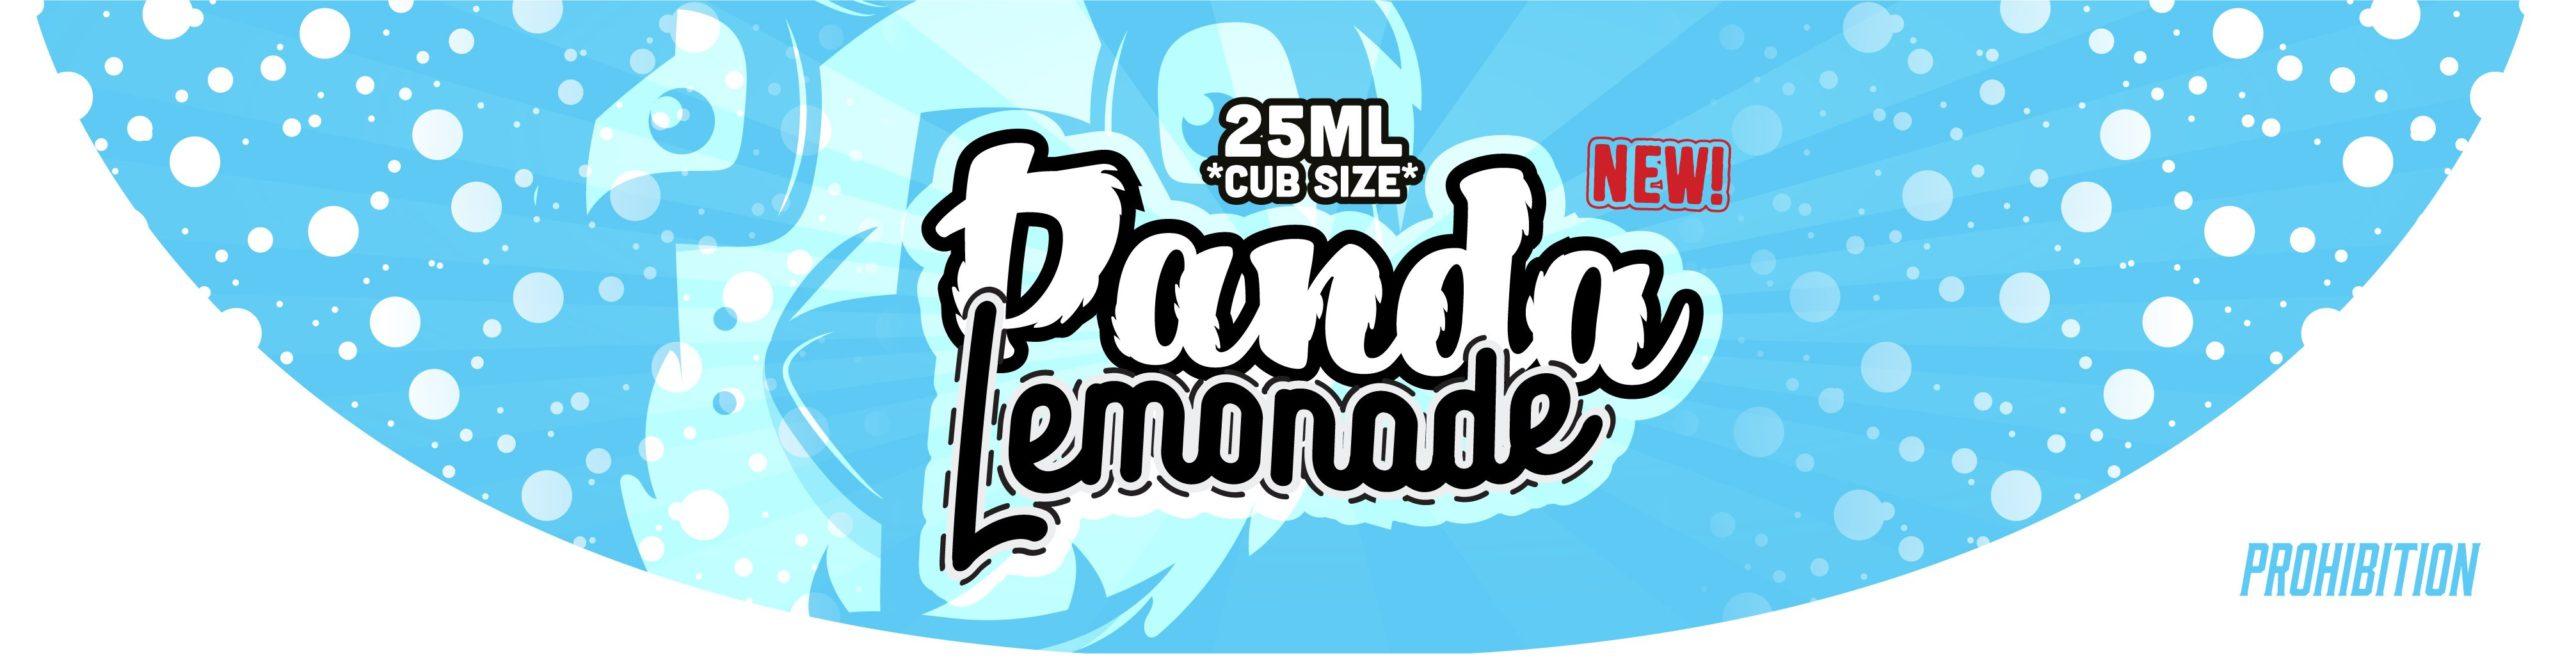 Panda Lemonade Header